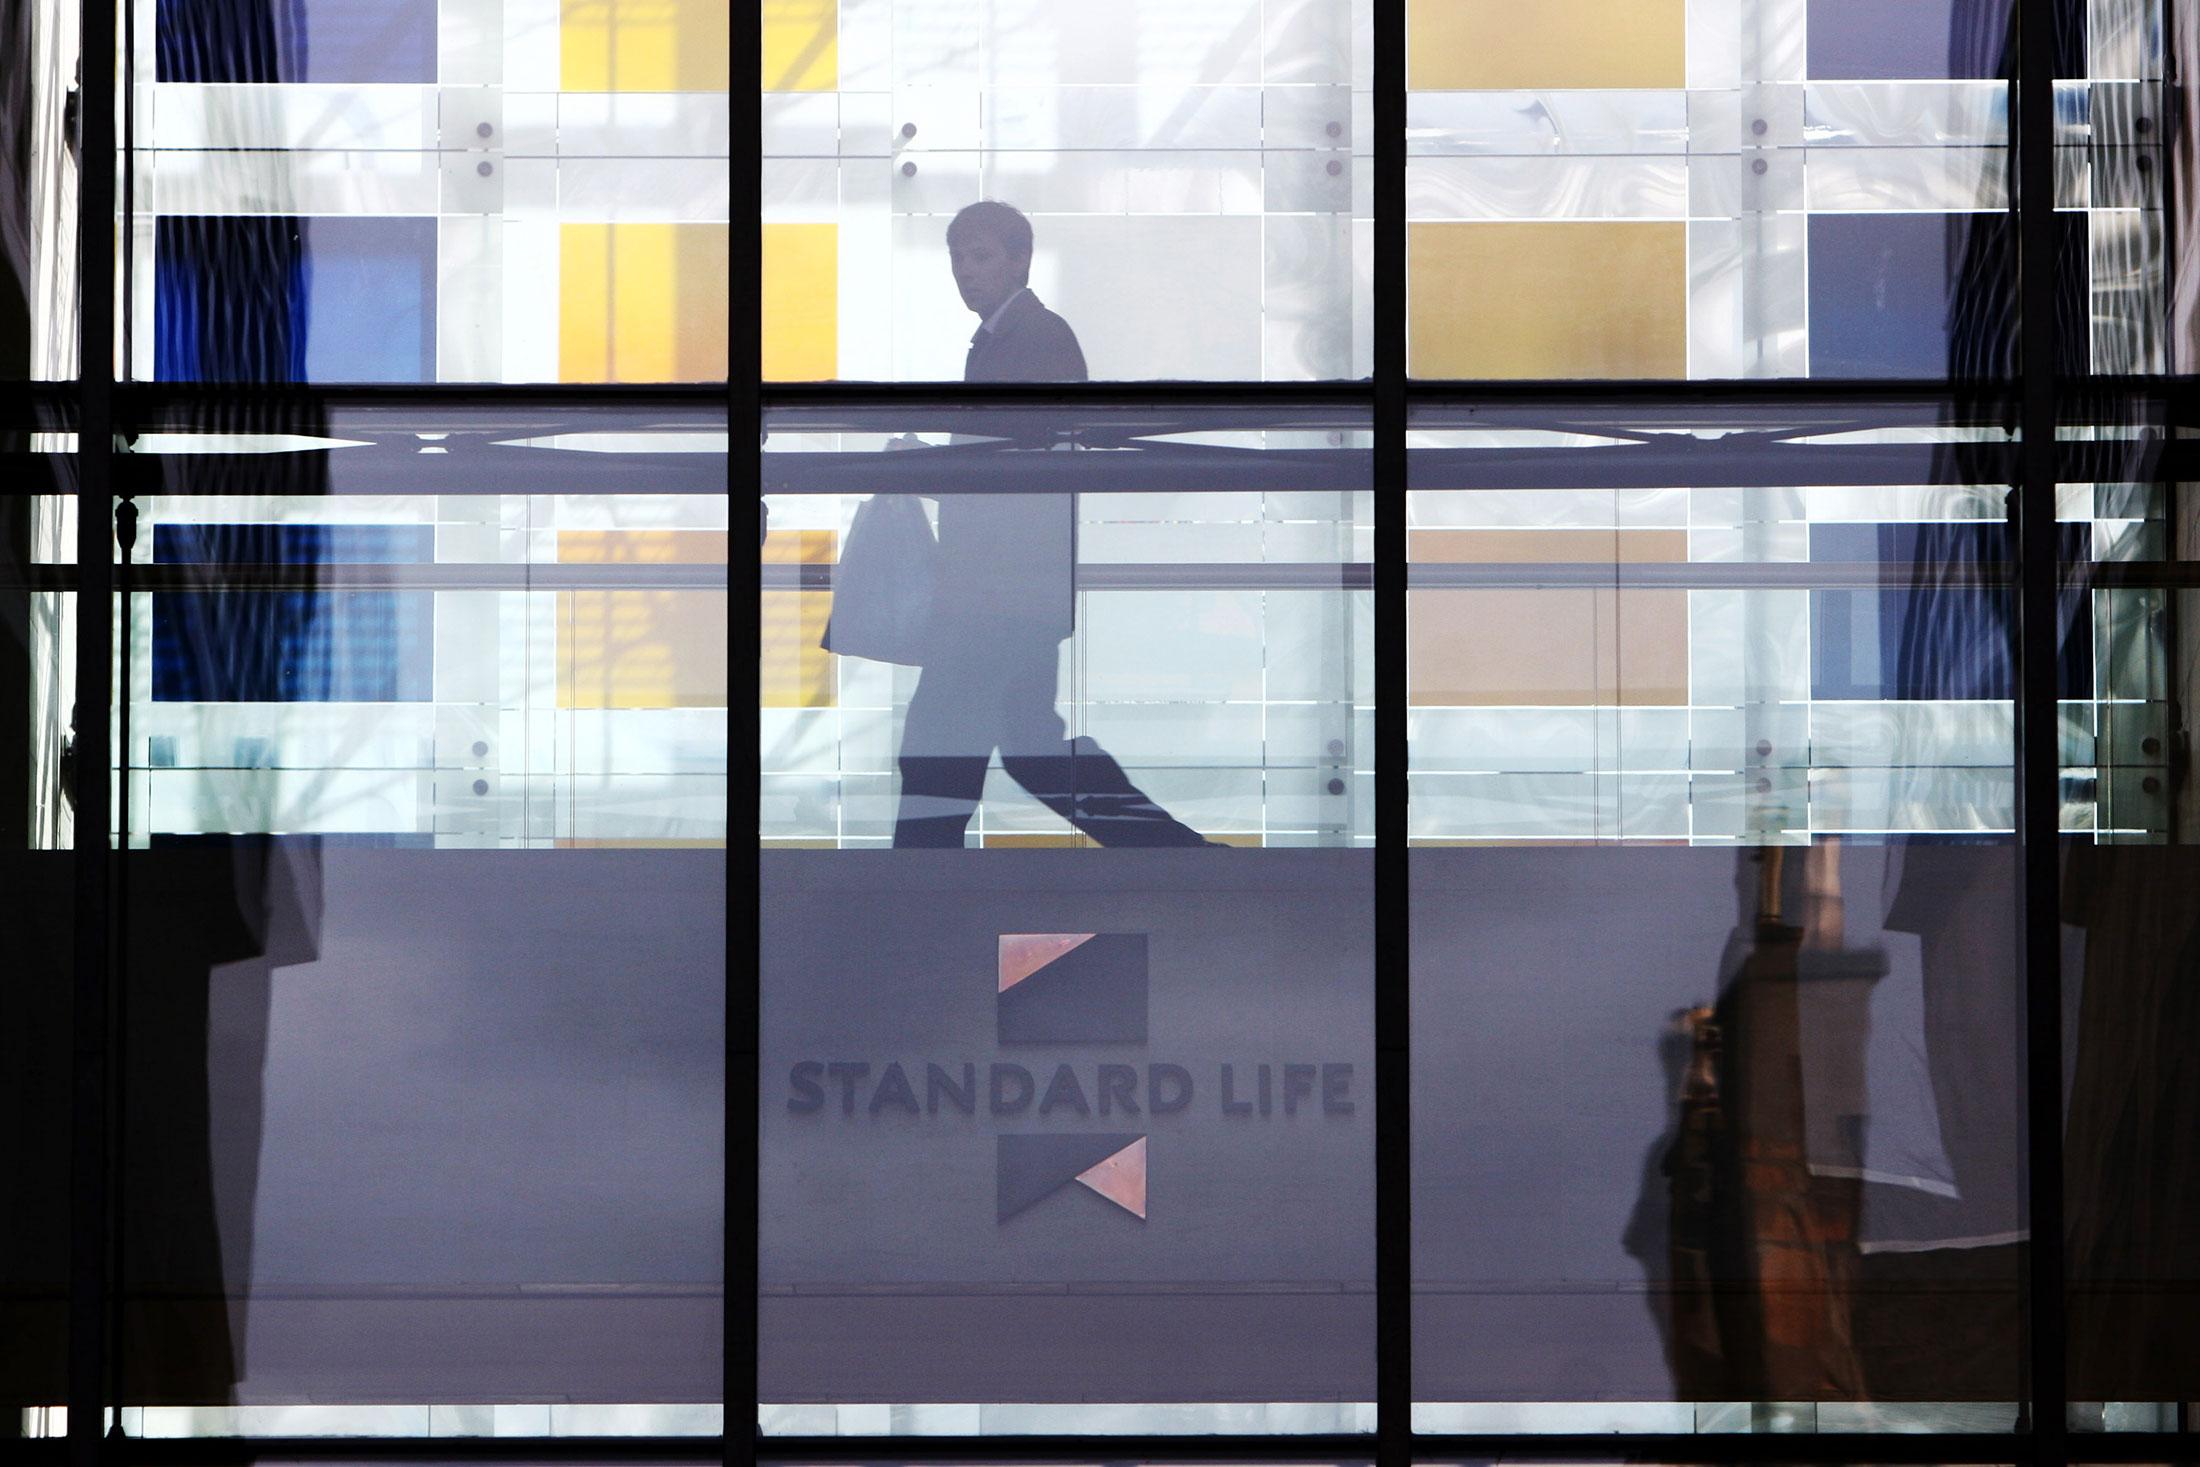 Standard life investments global ii - Standard Life Investments Global Ii 46